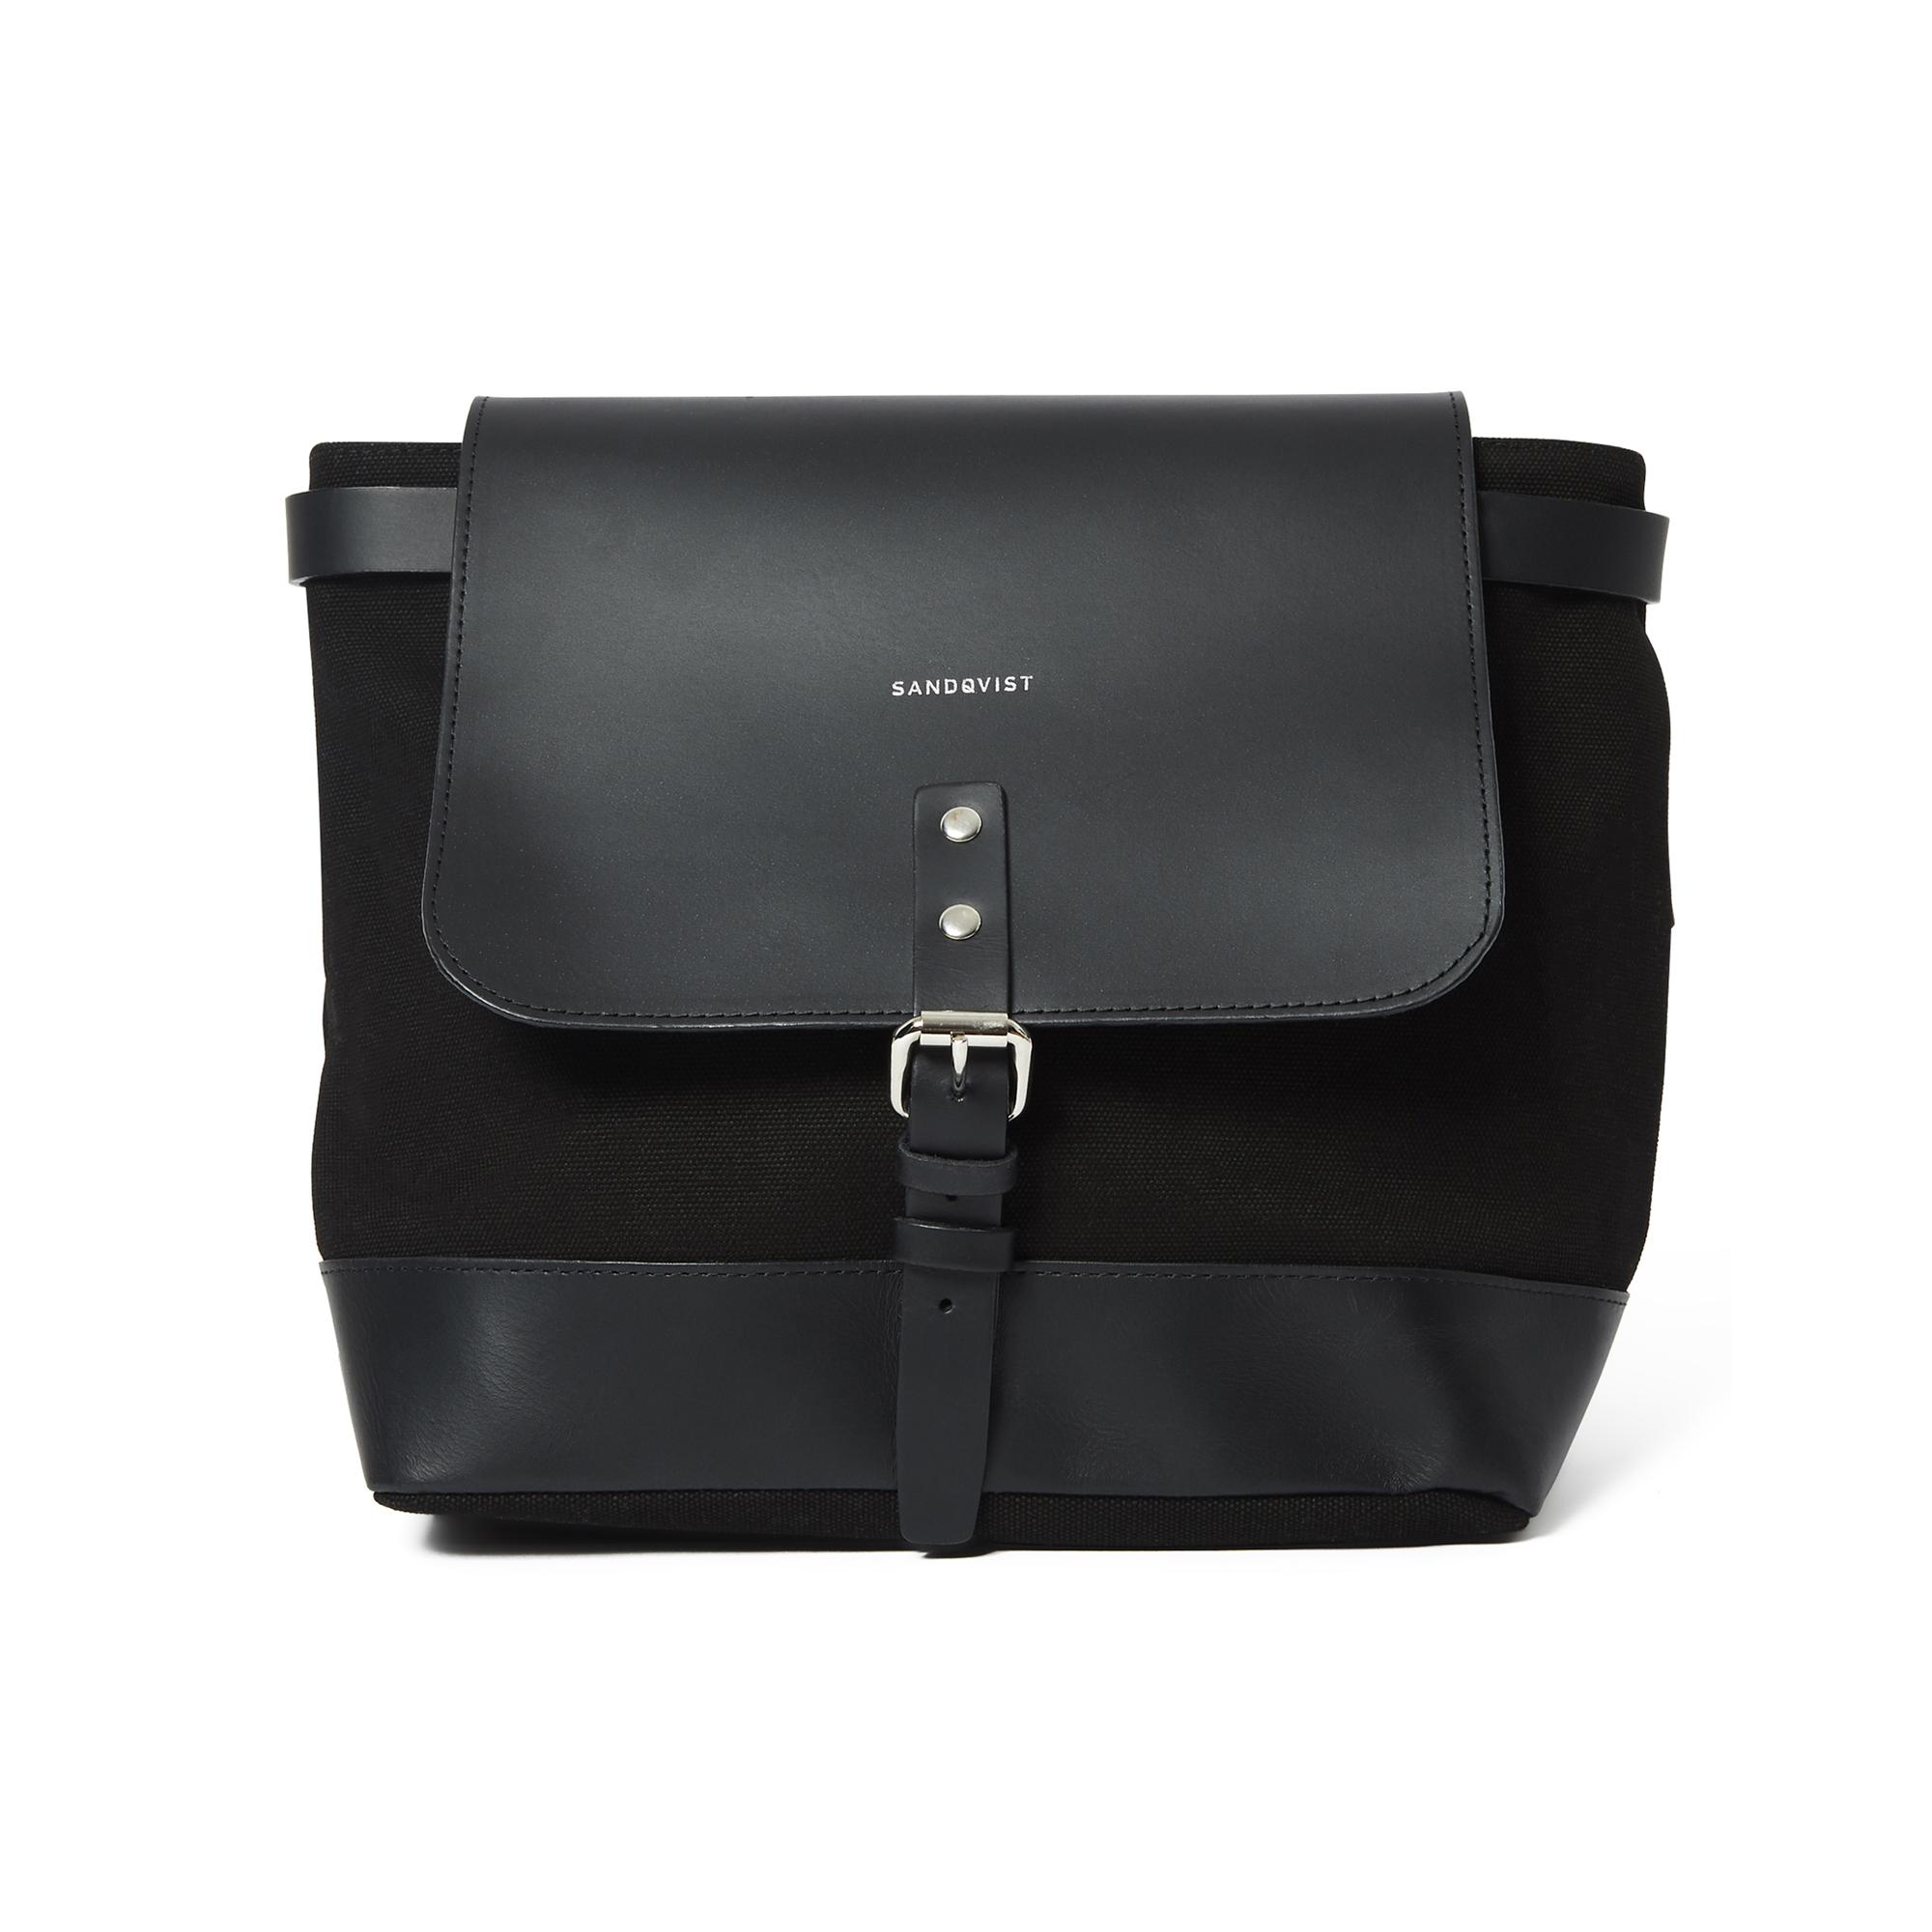 73f2142ad5c Women's designer handbags, shoulder bags, clutch bags: a selectio